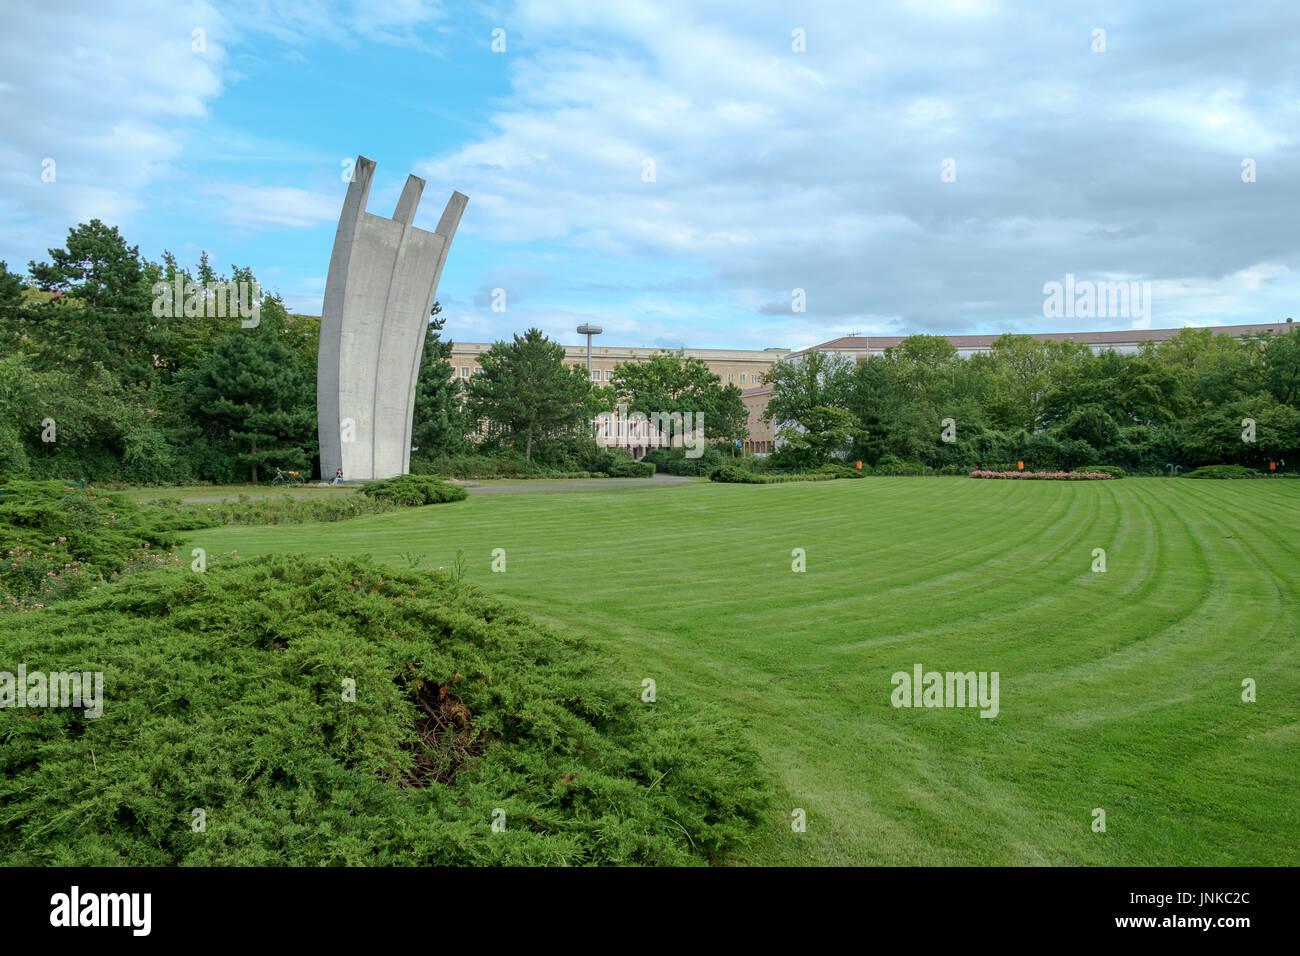 BERLIN, GERMANY / jULY 2017: Luftbruckendenkmal (Berlin Airlift Memorial) at the former Airport Tempelhof, Platz der Luftbrucke, Berlin, Germany. - Stock Image